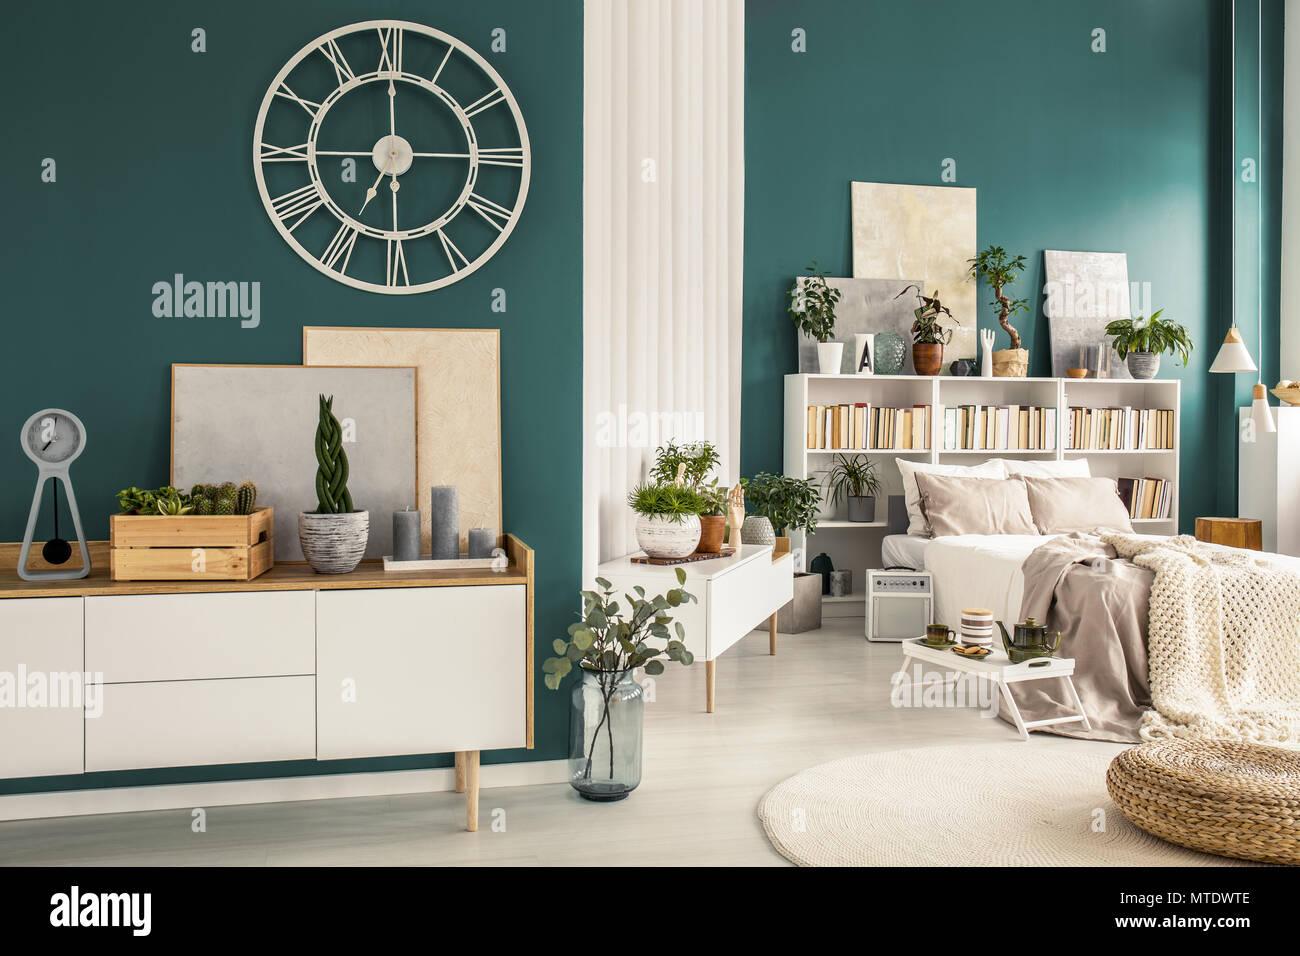 Modern studio apartment interior with cozy bedroom, white wooden ...